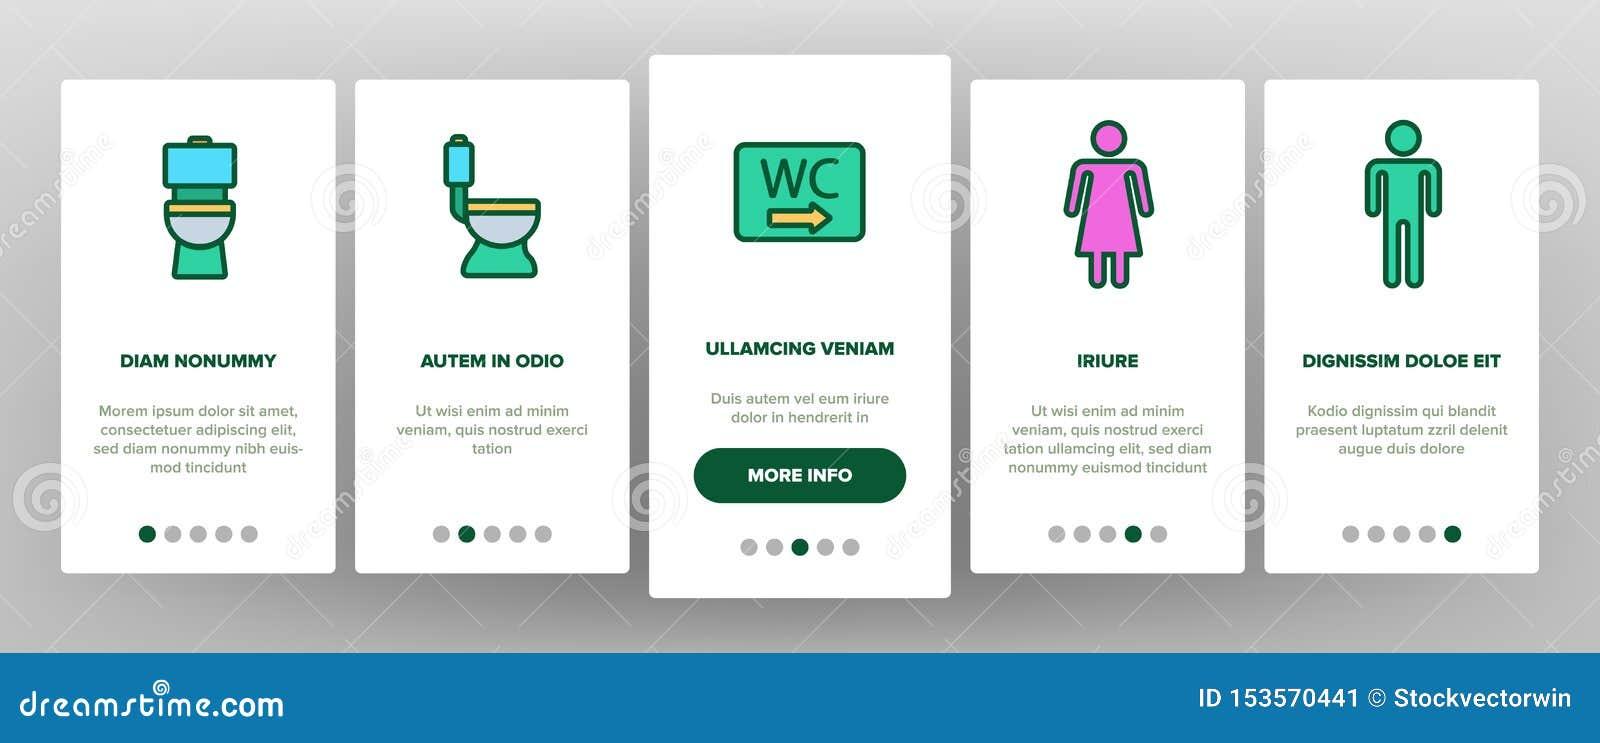 WC, Public Bathroom, Toilet Vector Onboarding Stock Vector ...